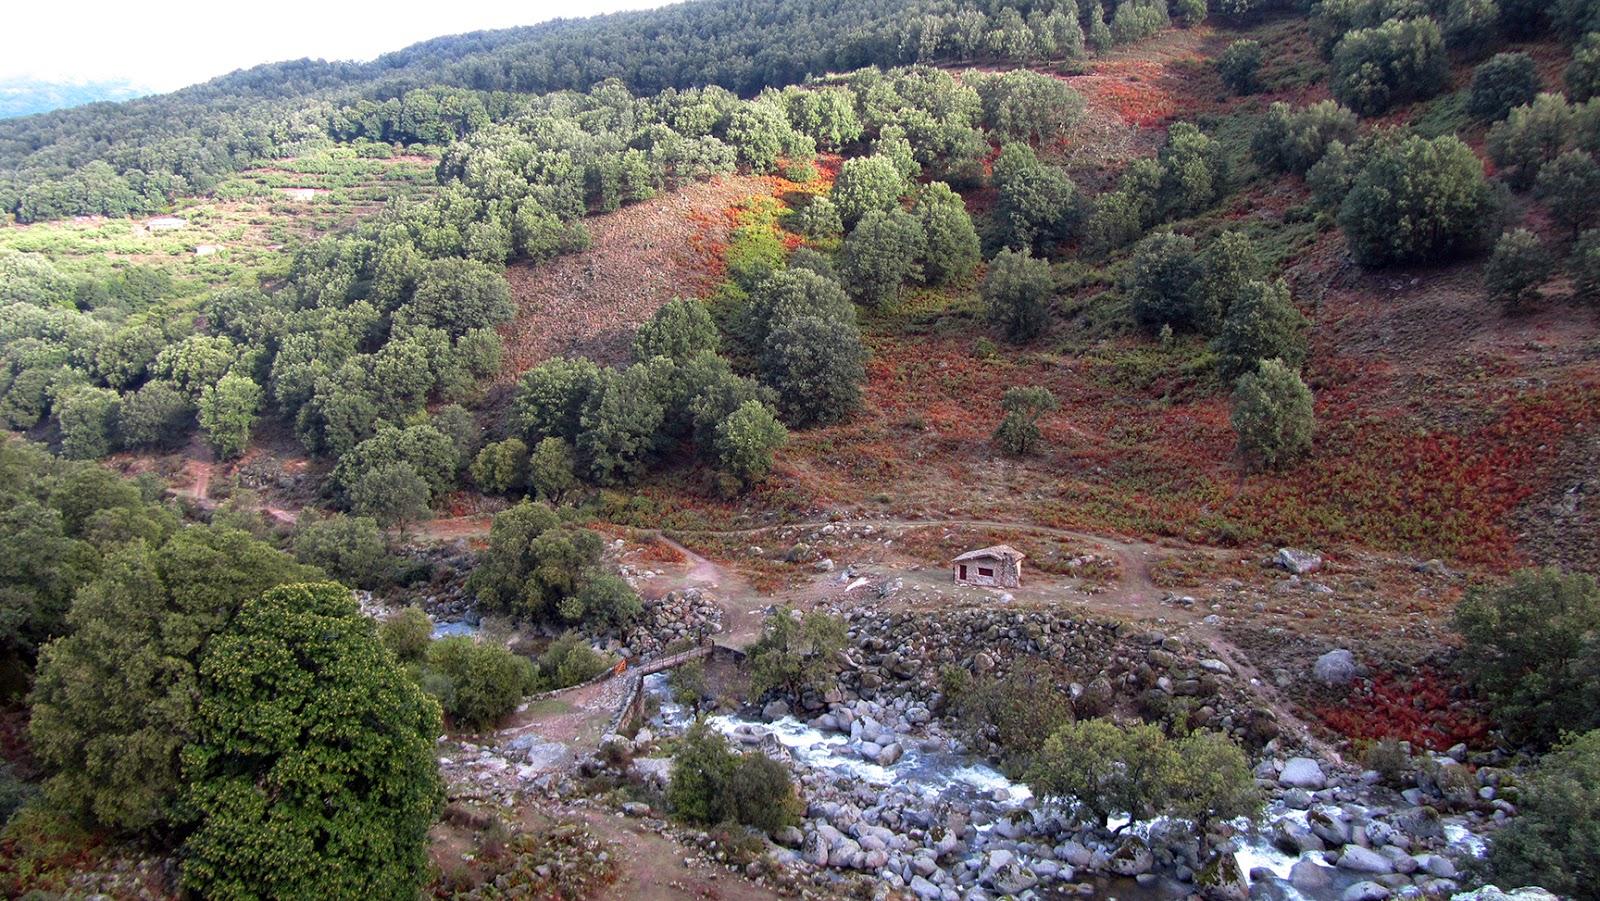 Valle del Jerte - Refugio